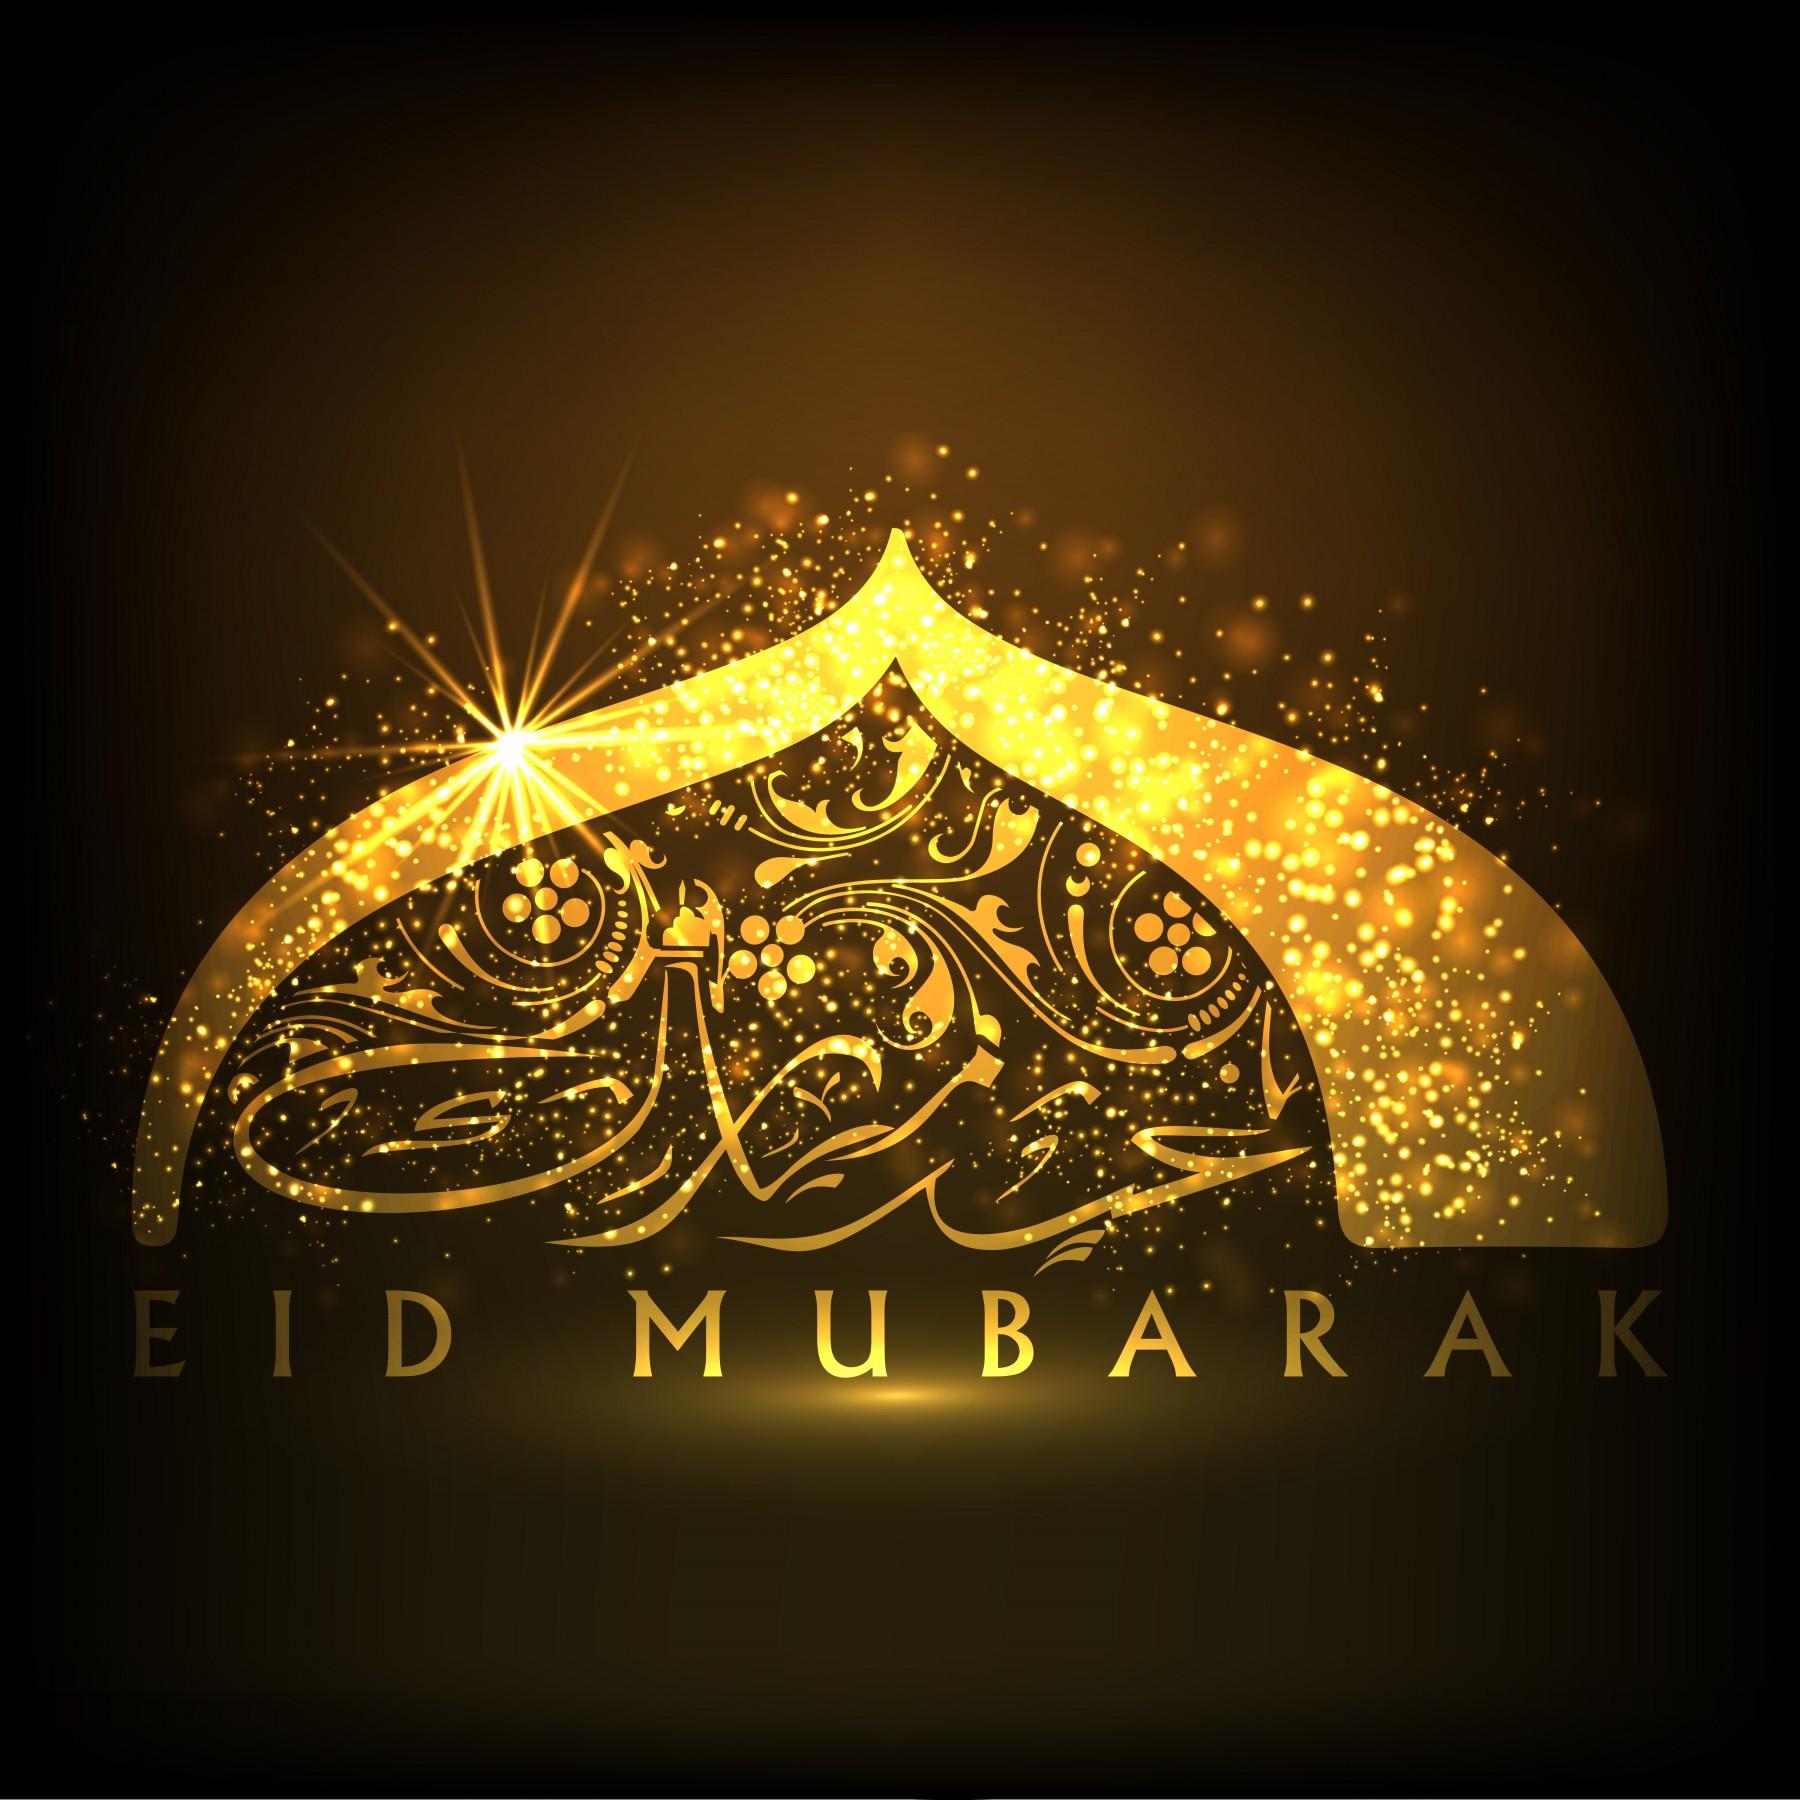 Best Images, Backgrounds, Cards Eid Mubarak. Eid al-Adha & Eid al-Fitr